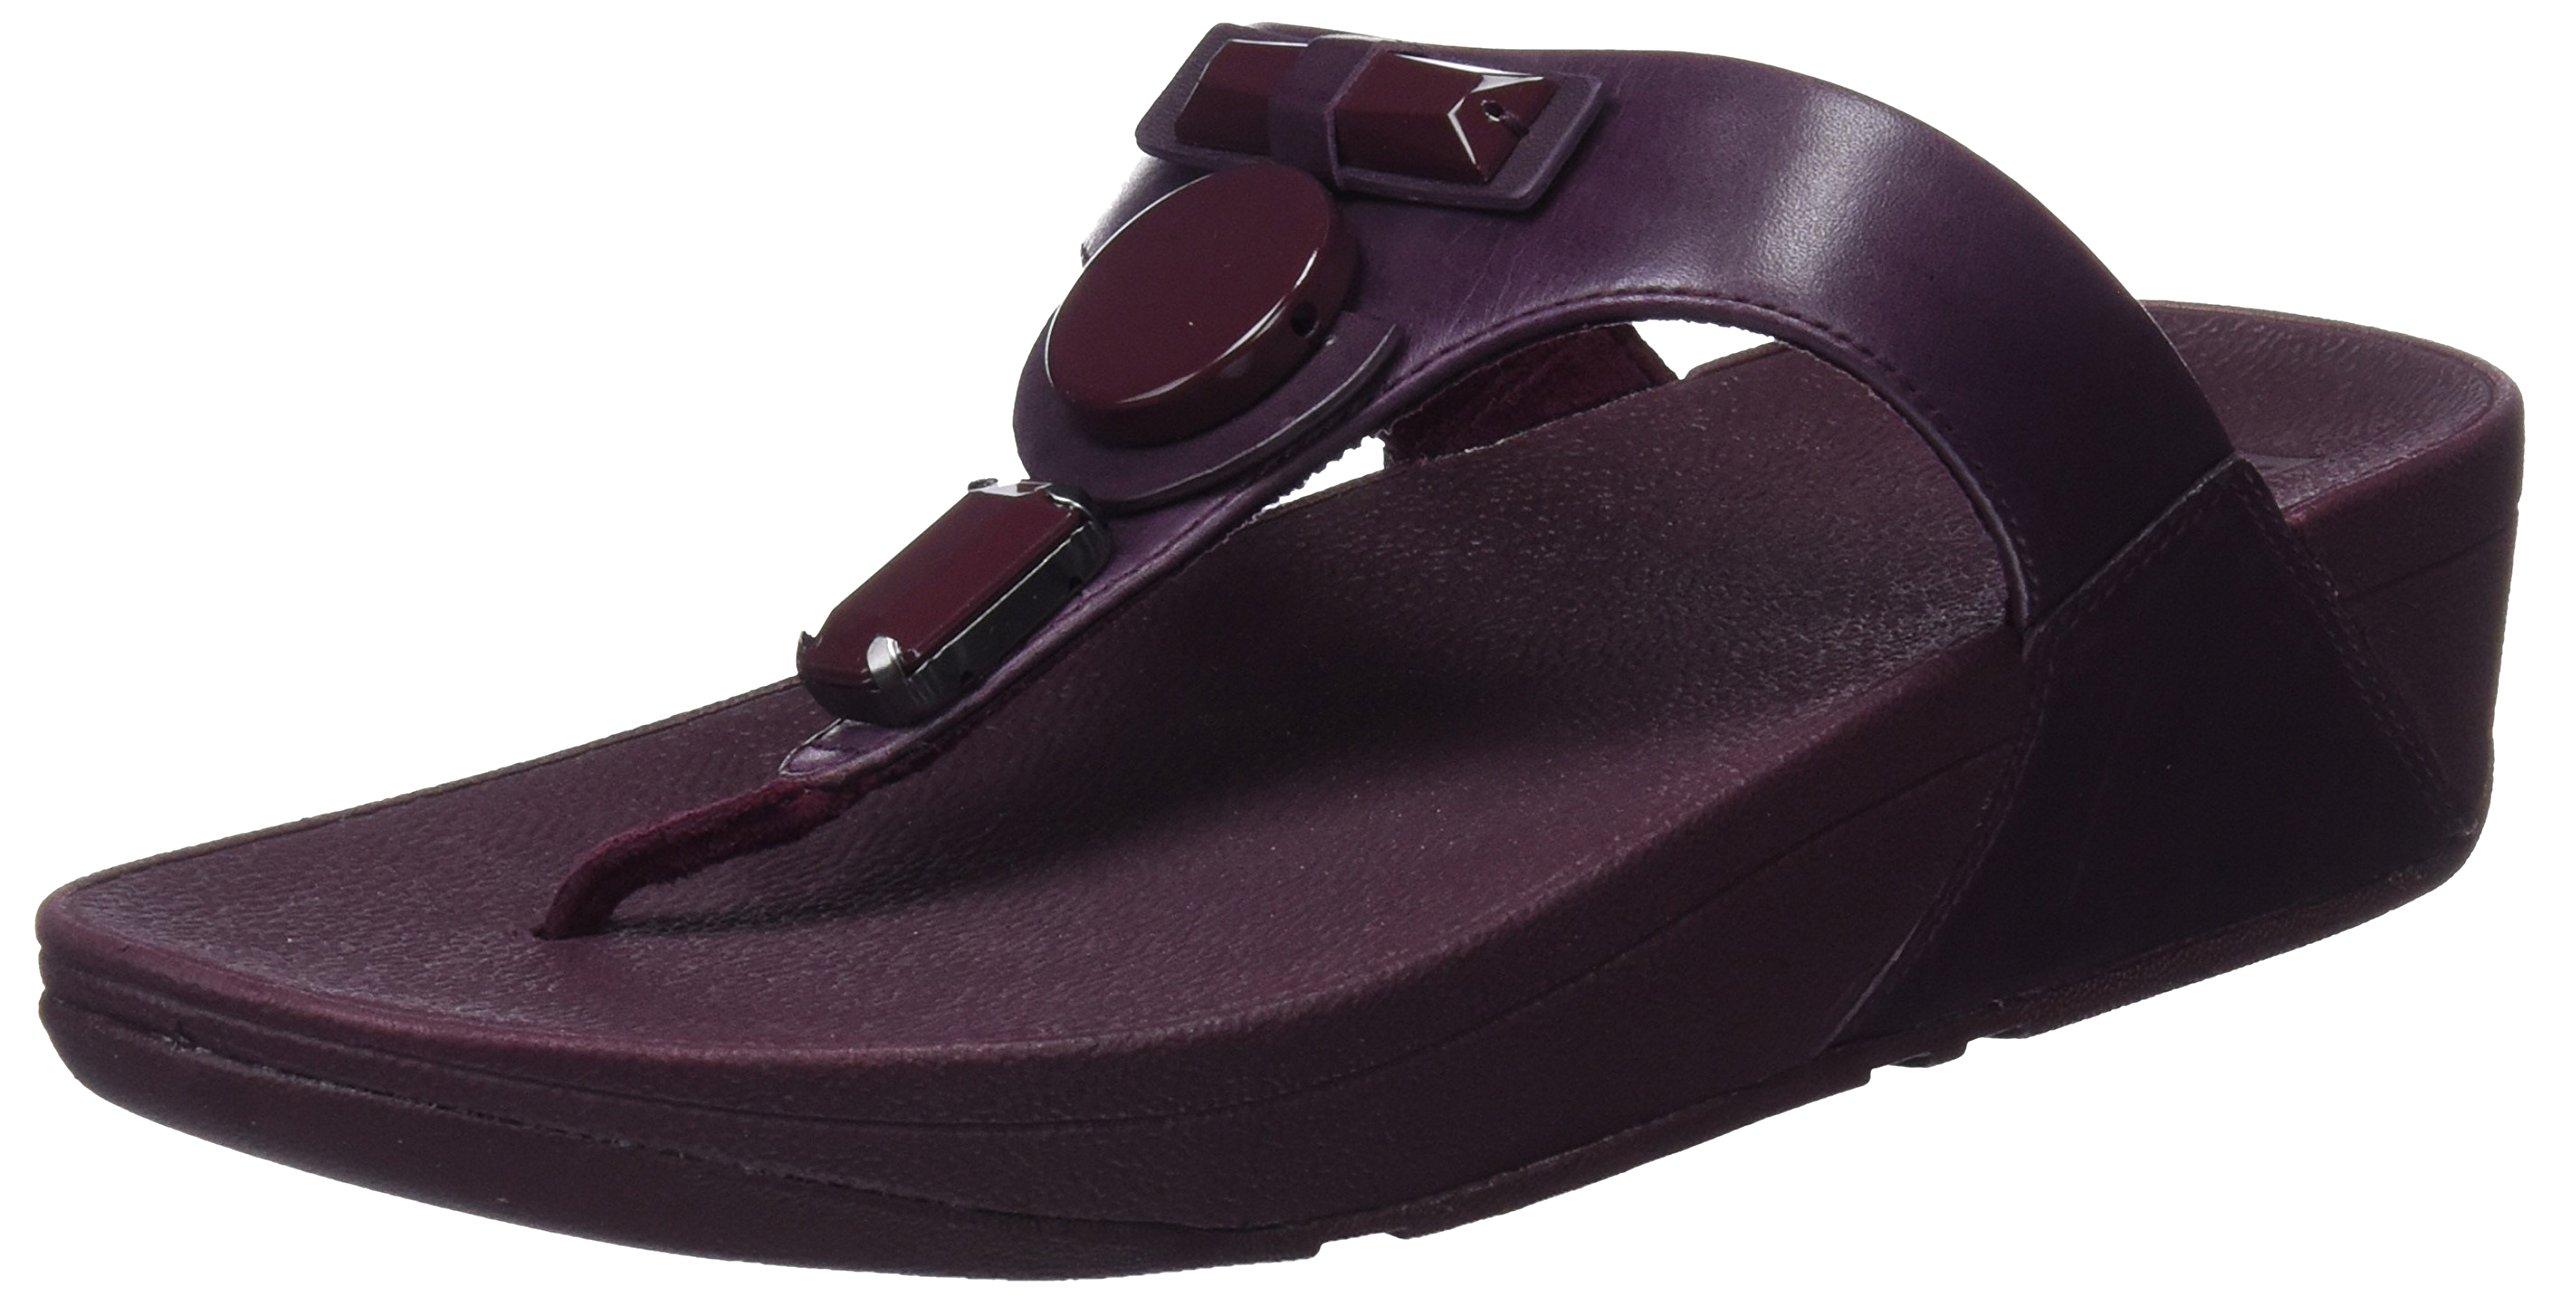 Plateforme Sandals FemmeVioletdeep 39836 Fitflop thong Plum Eu Glamoritz Toe 8ONPm0vnyw